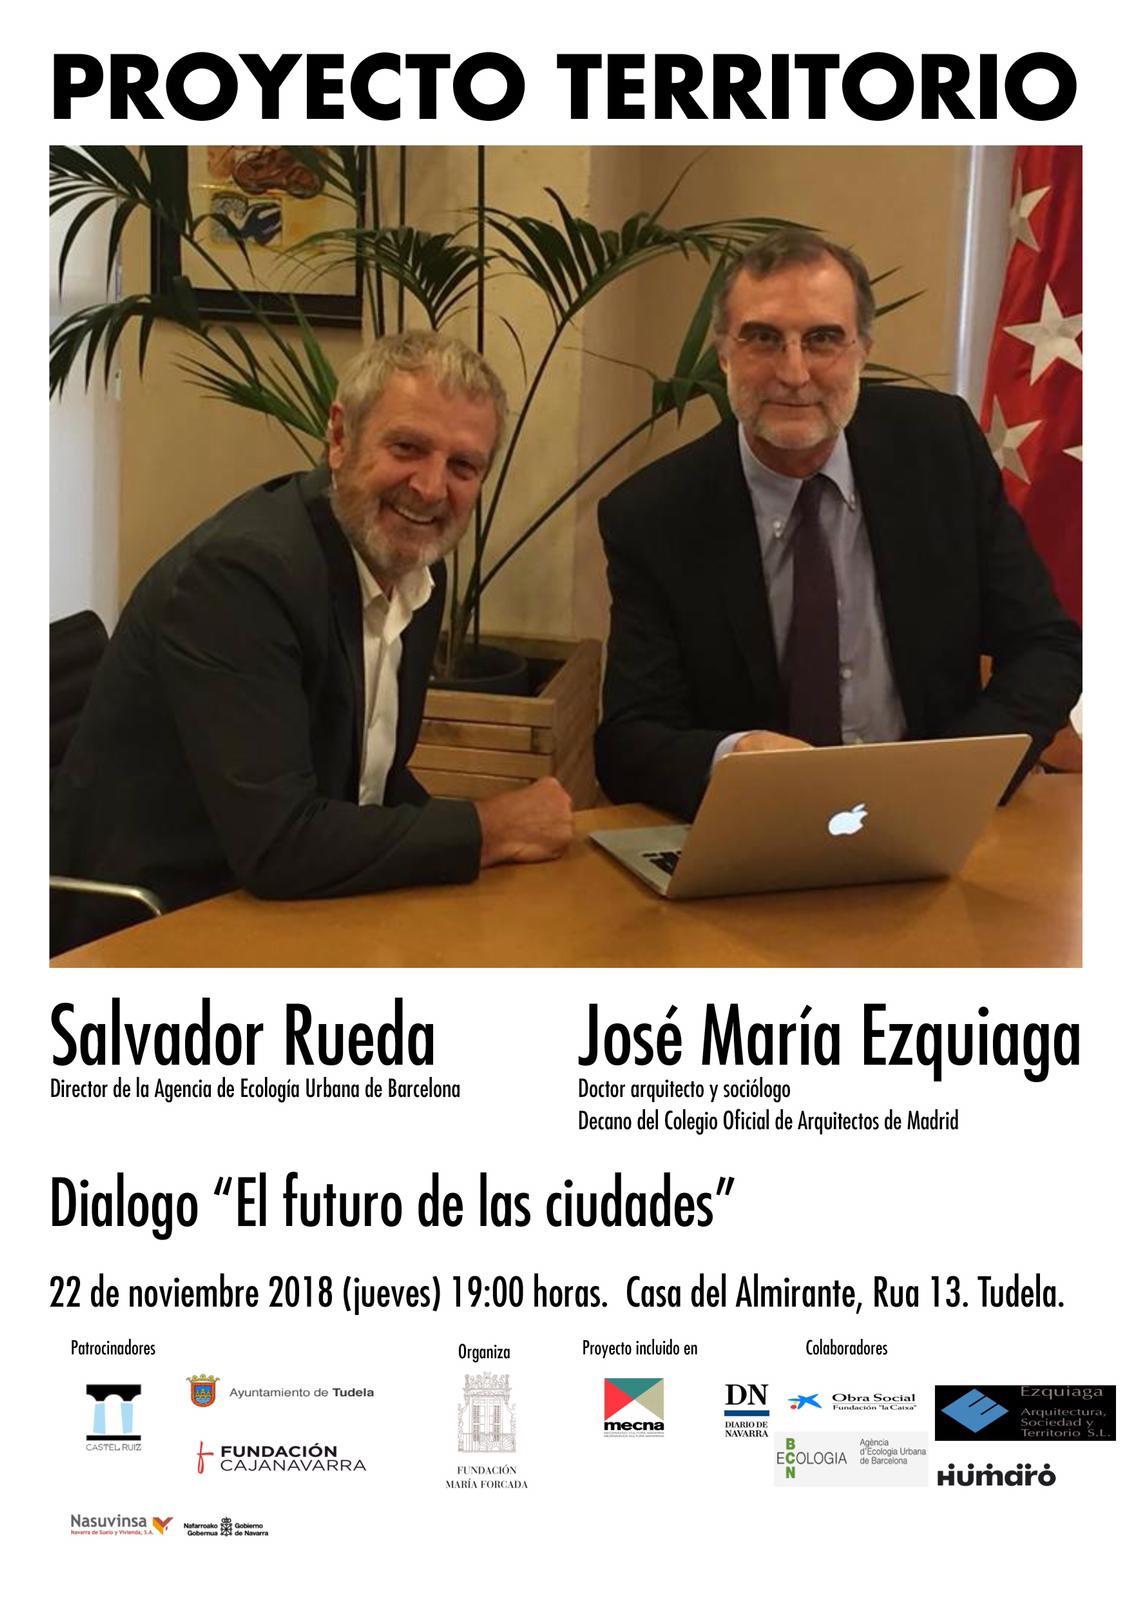 Fundación María Forcada. PROYECTO TERRITORIO